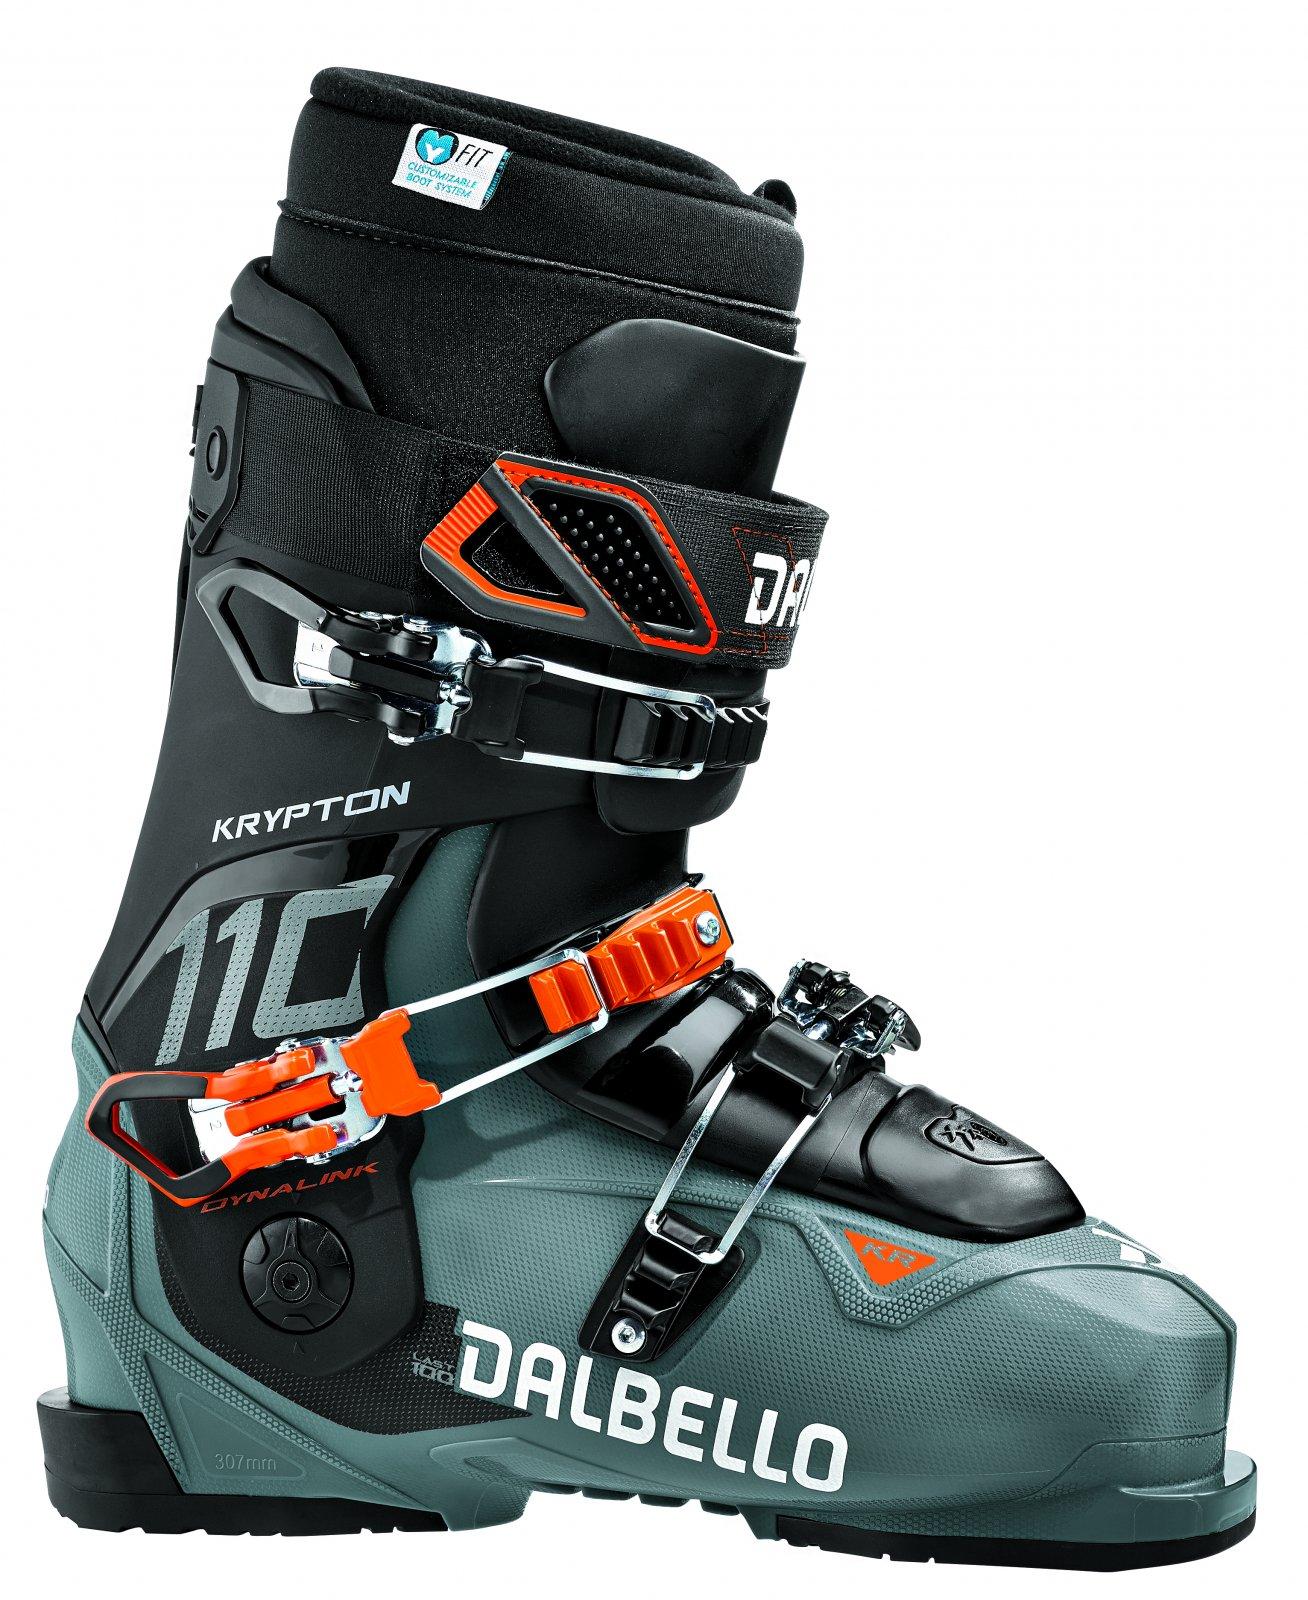 Dalbello Krypton 110 ID Ski Boots 2020 - 26.5